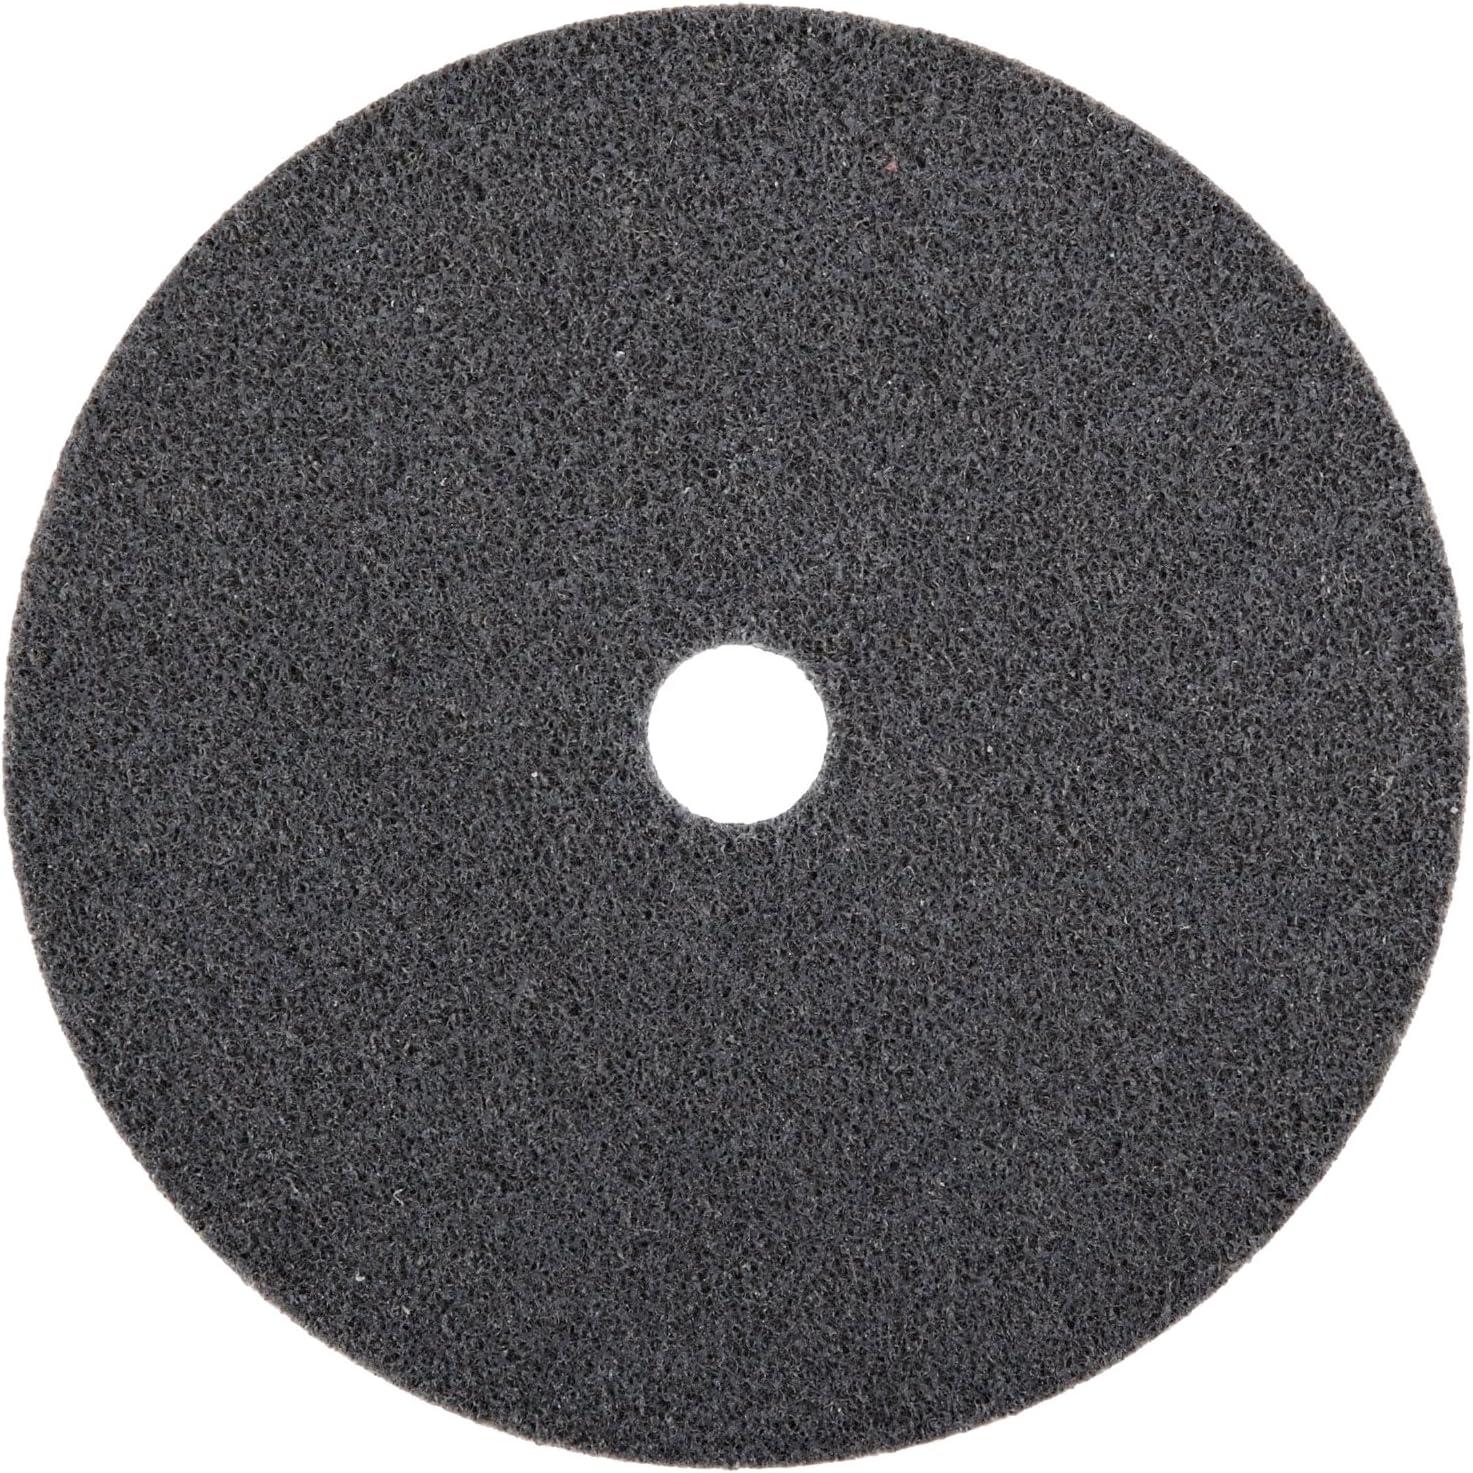 18100 rpm 6S Fine Grit 3//8 Arbor Scotch-Brite EXL Unitized Wheel 3 Diameter Pack of 1 Silicon Carbide